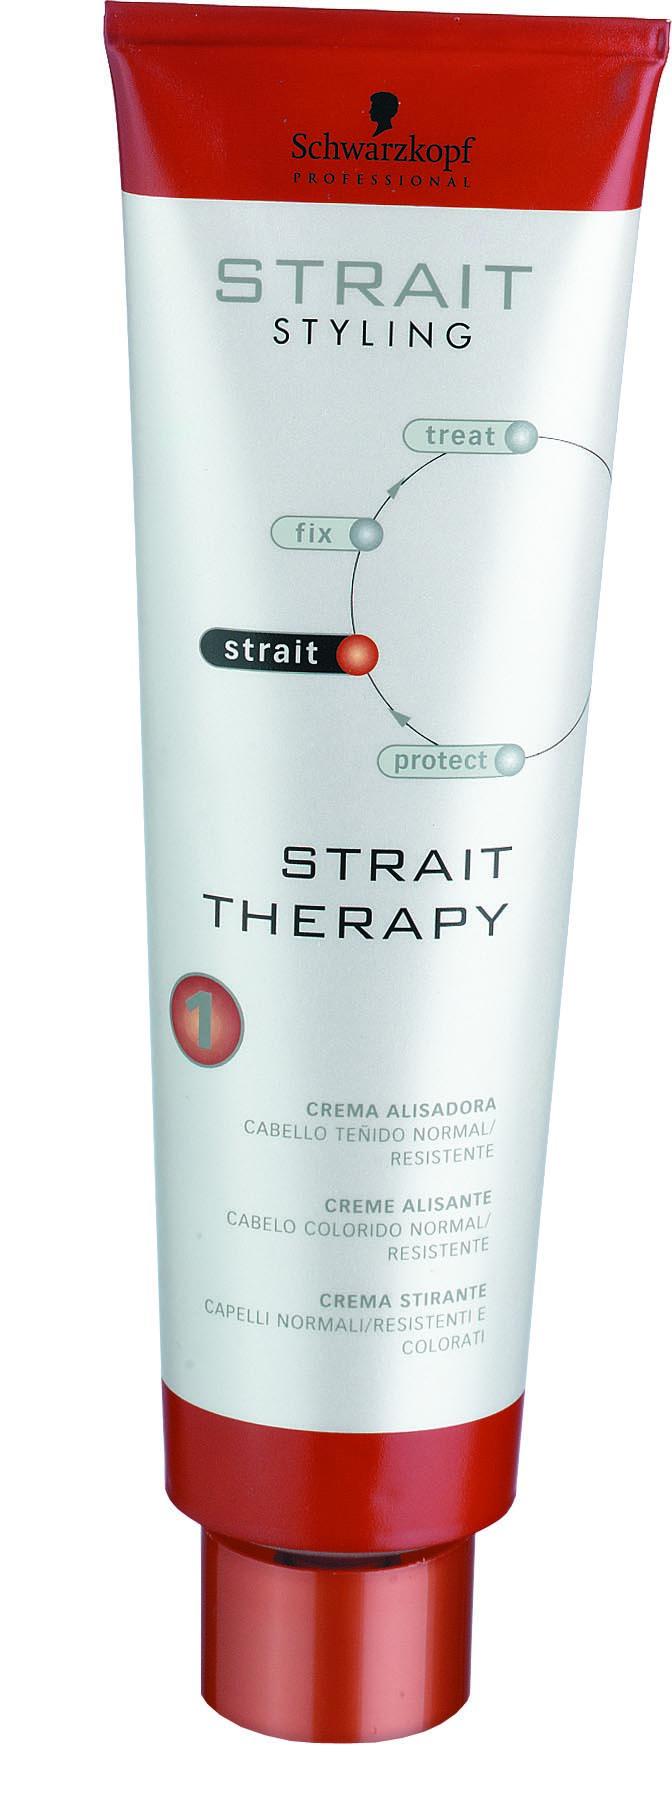 Schwarzkopf STRAIT STYLING THERAPY Cream 1, 300 ml